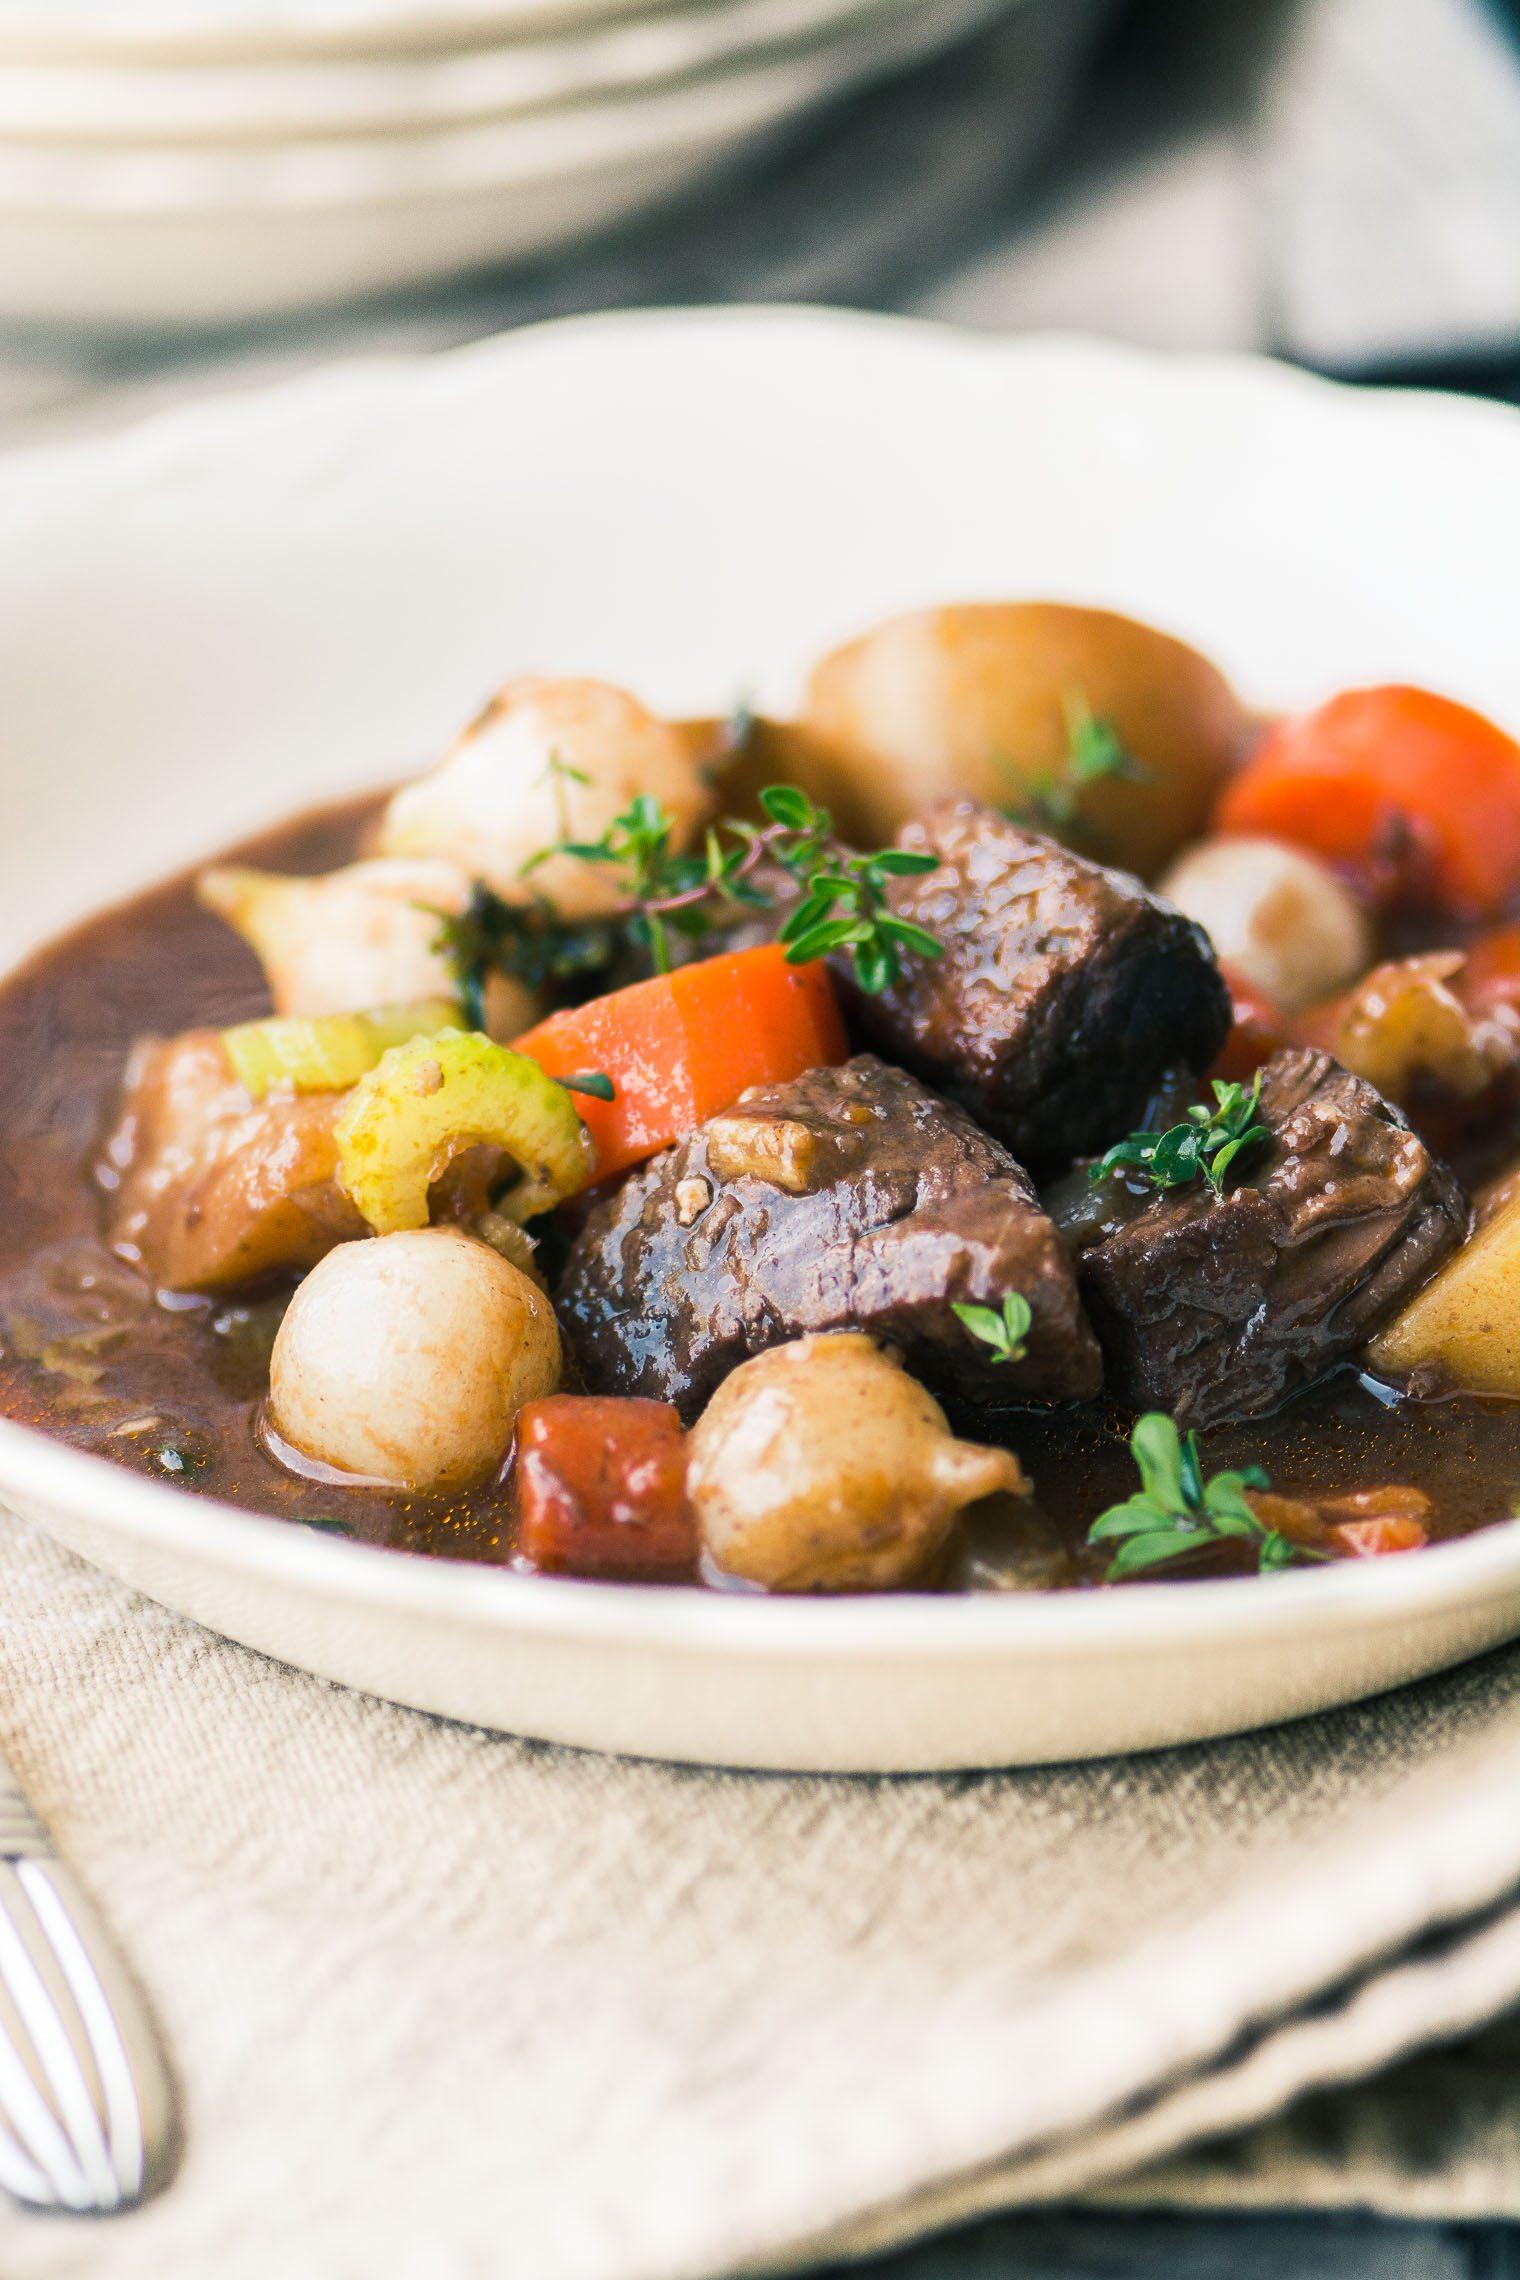 Instant Pot Beef Bourguignon in a white bowl